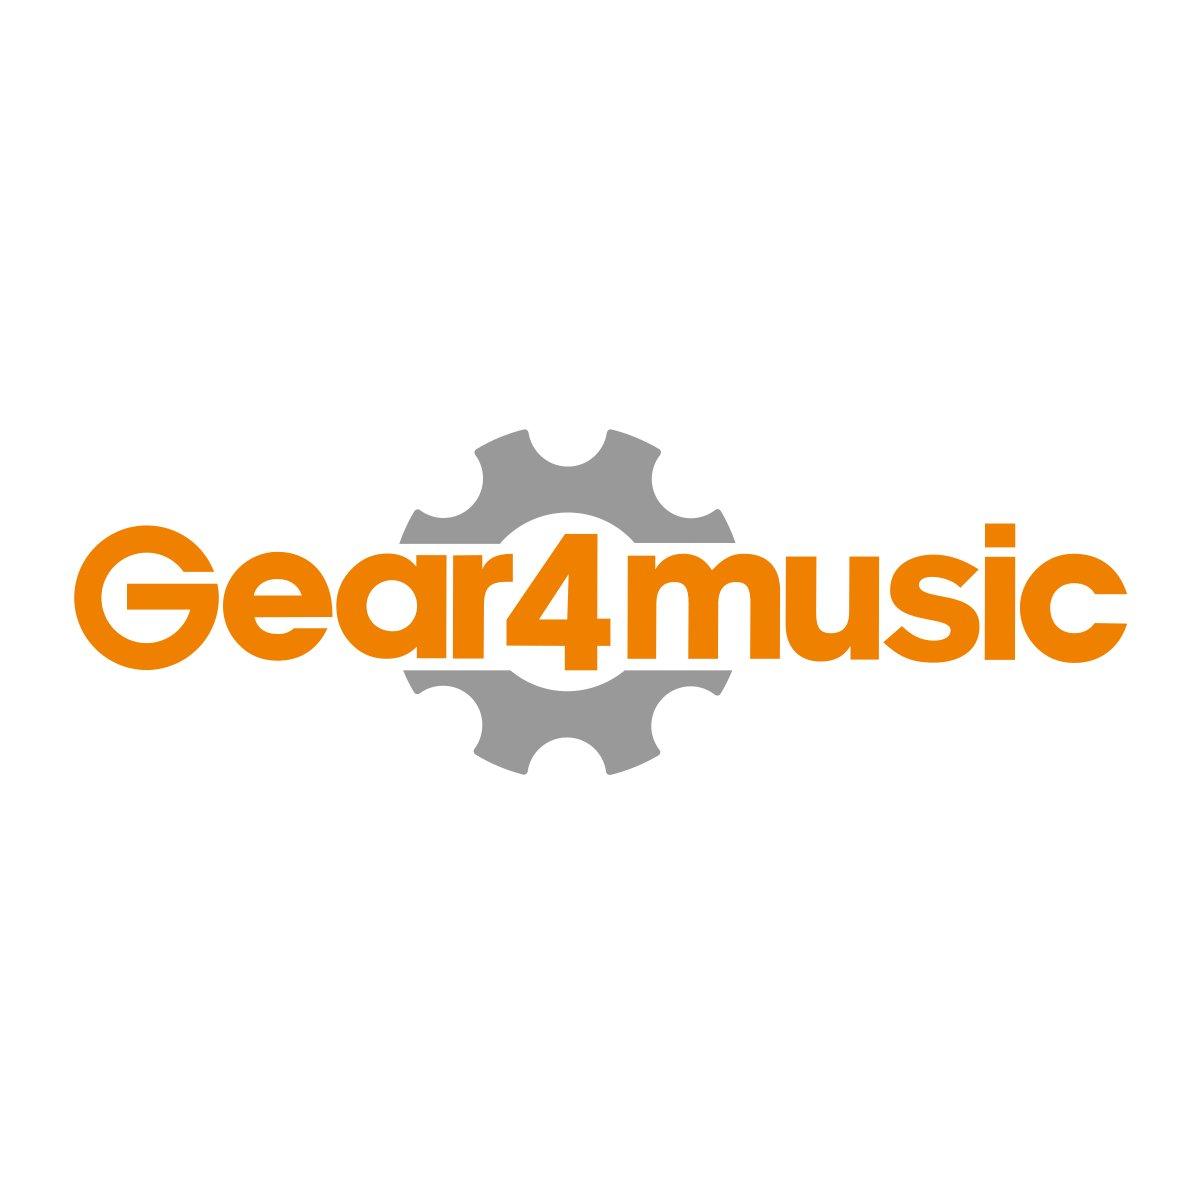 oregon 6 string neck thru bass guitar by gear4music natural at gear4music. Black Bedroom Furniture Sets. Home Design Ideas